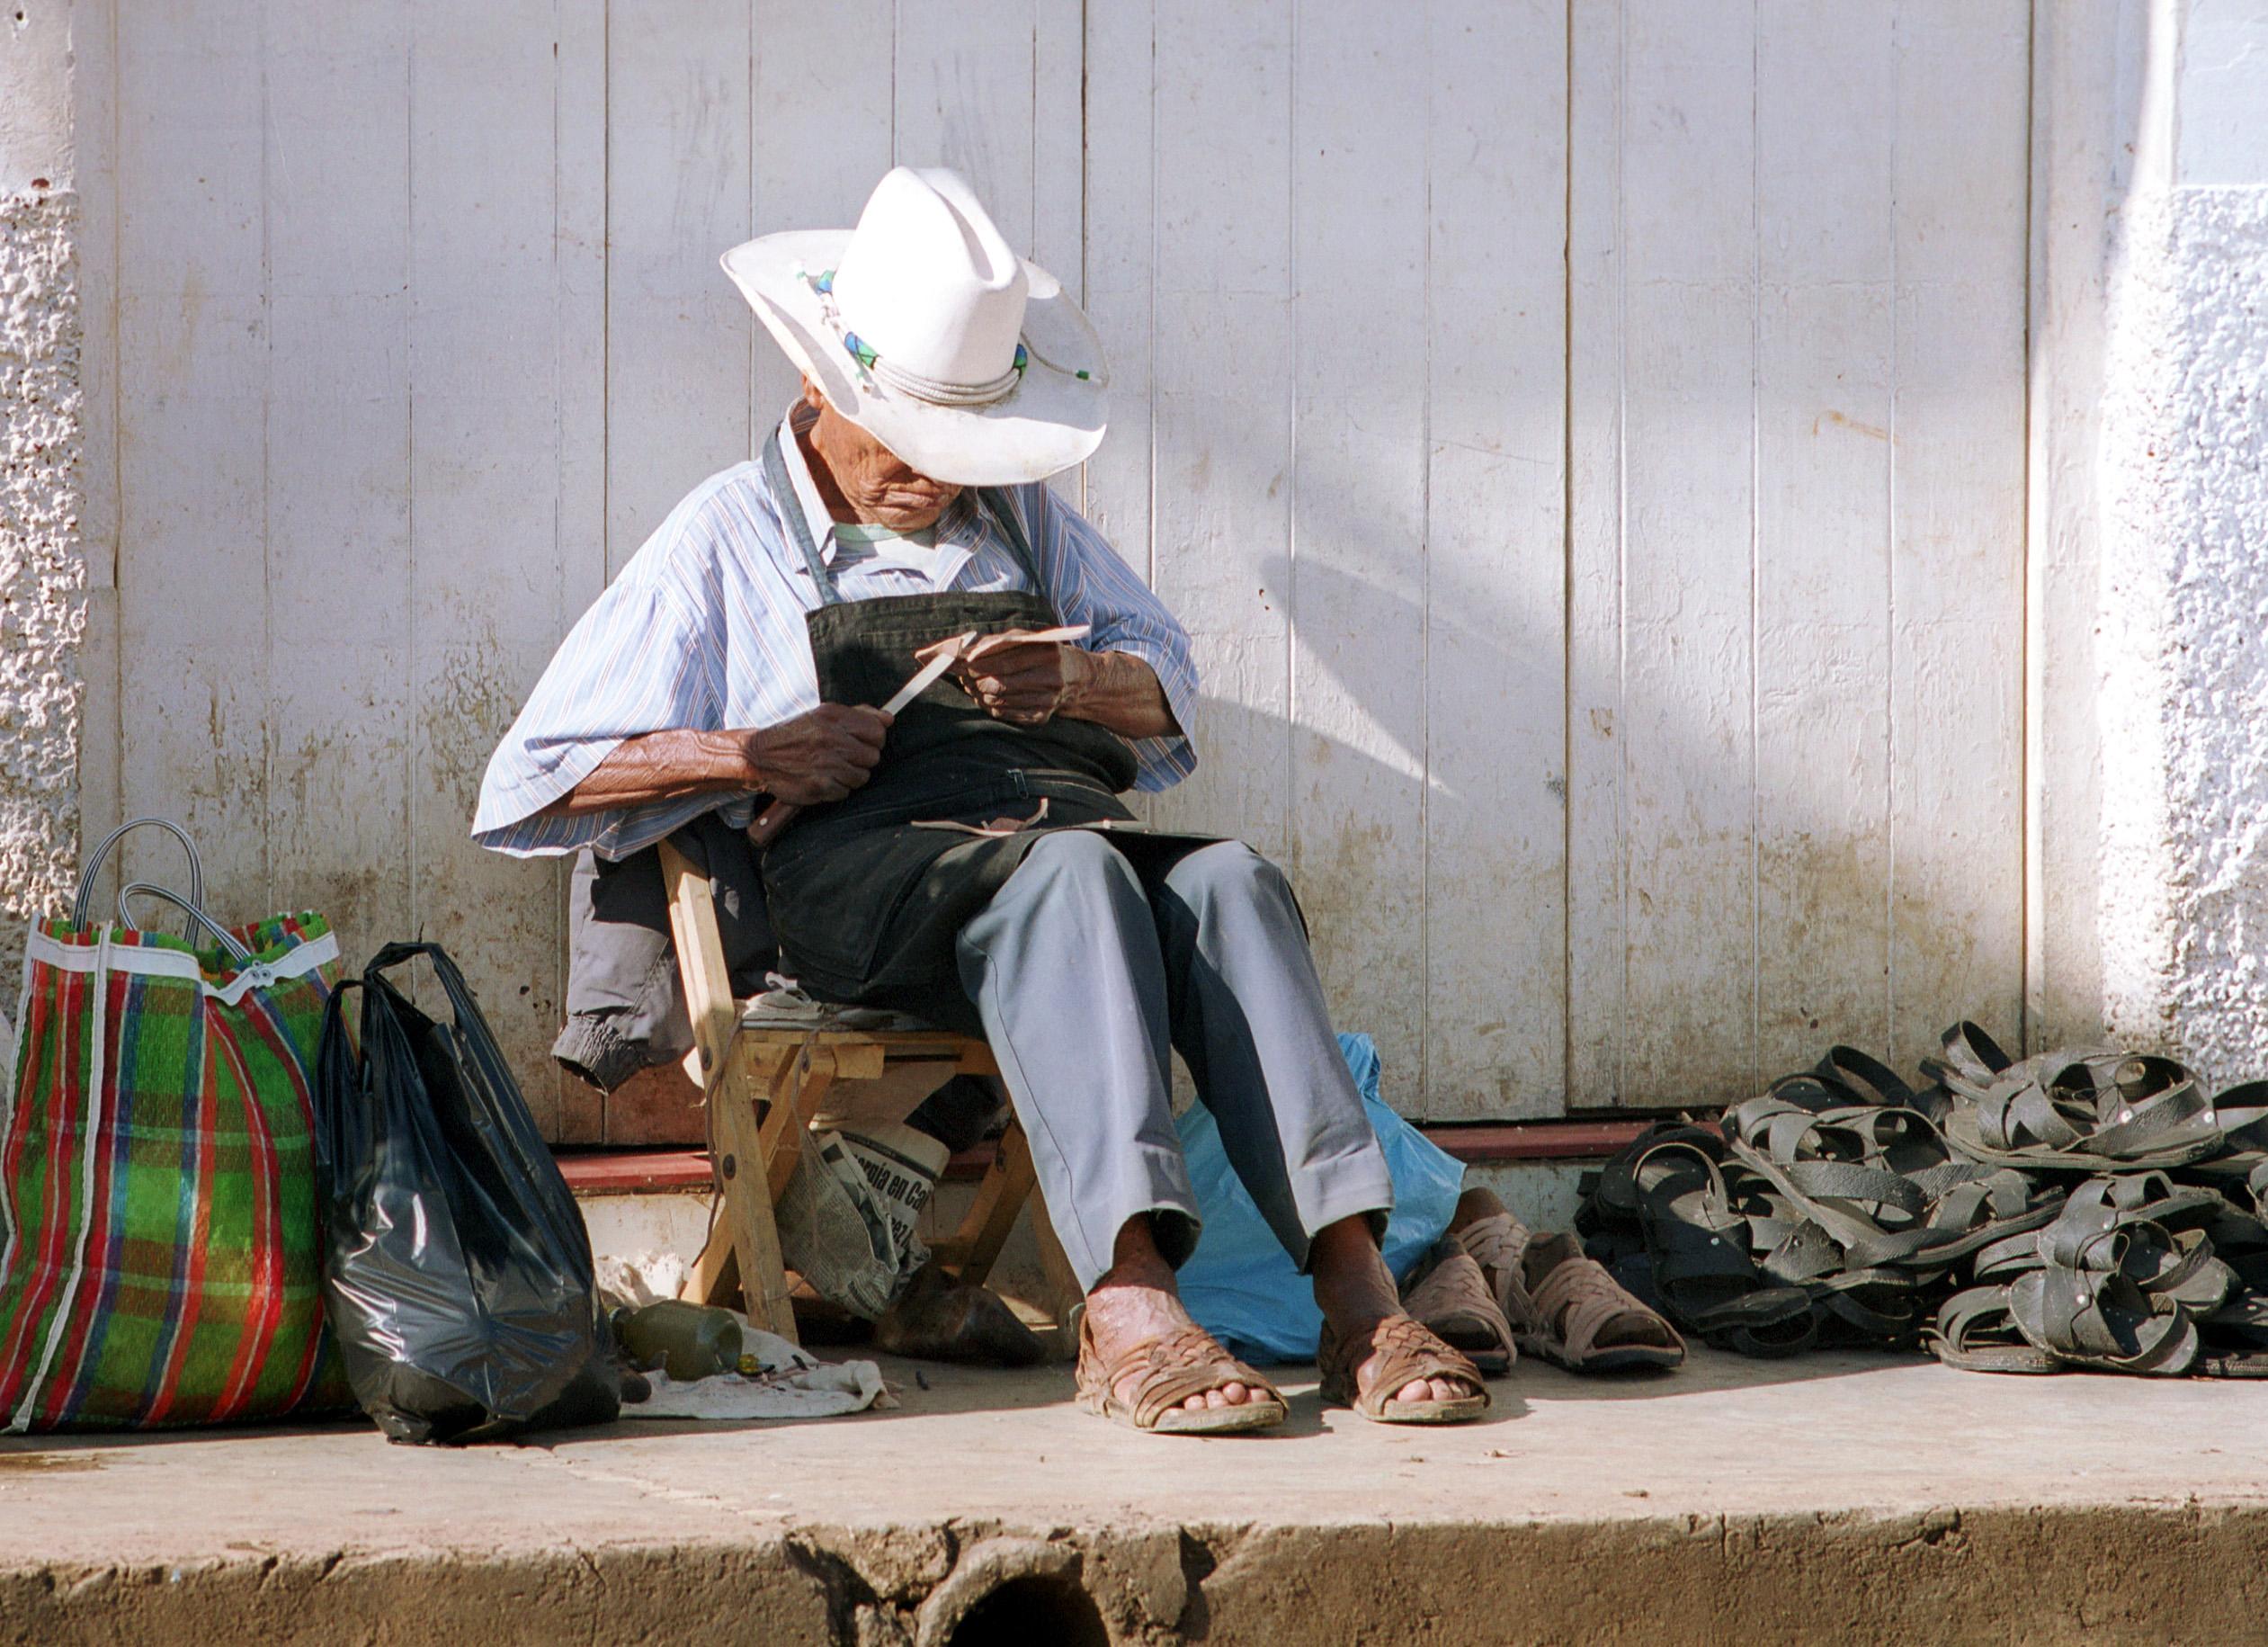 Schuhmacher in San Cristóbal, Mexiko